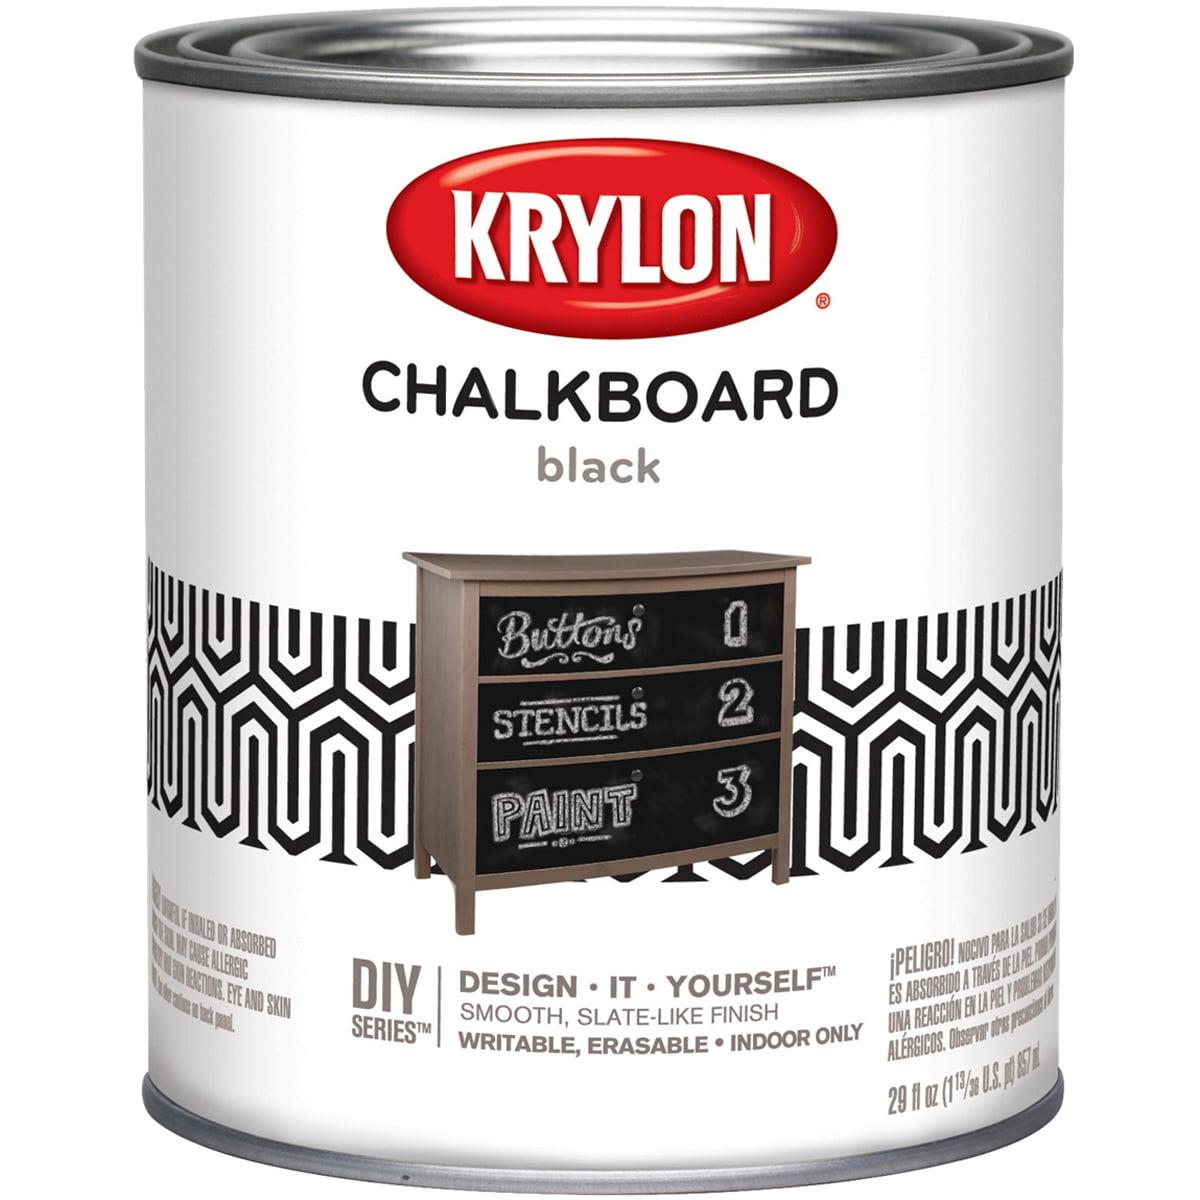 Krylon Chalkboard Paint Quart Black